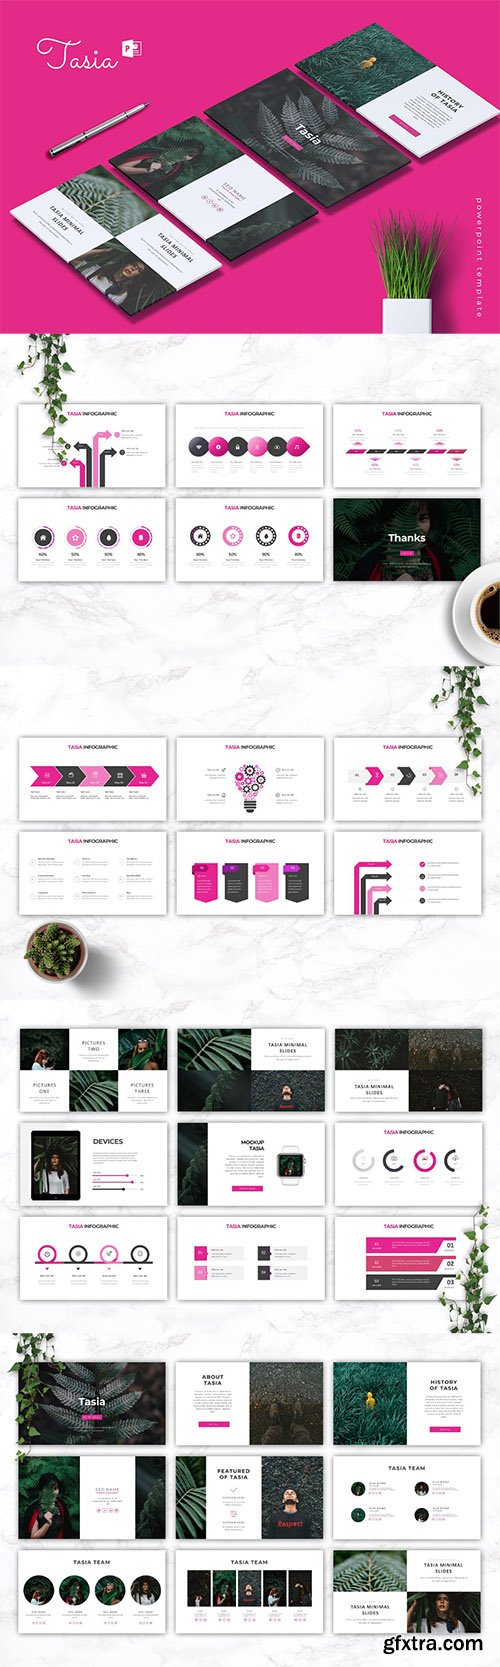 TASIA - Company Profile Powerpoint, Keynote and Google Slides Templates